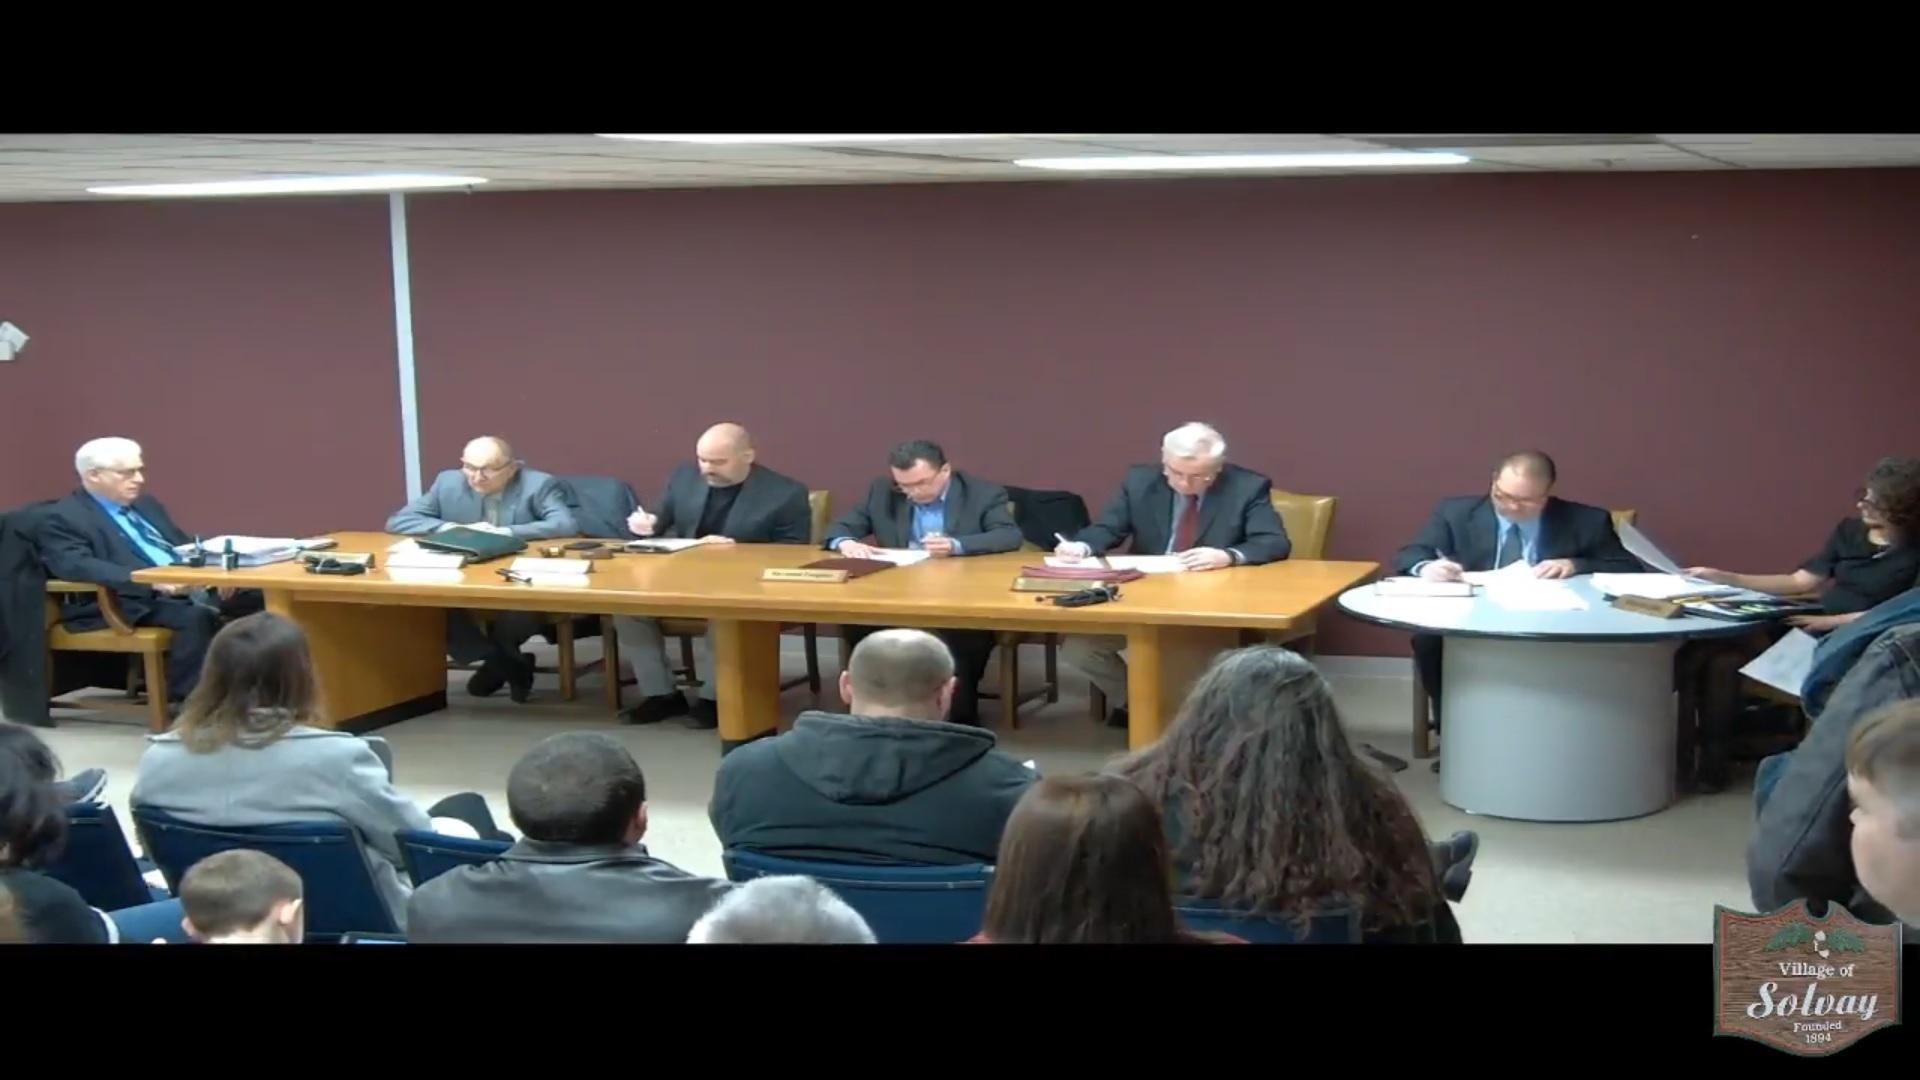 Village of Solvay Special Board-Organizational Meeting January 7 2020